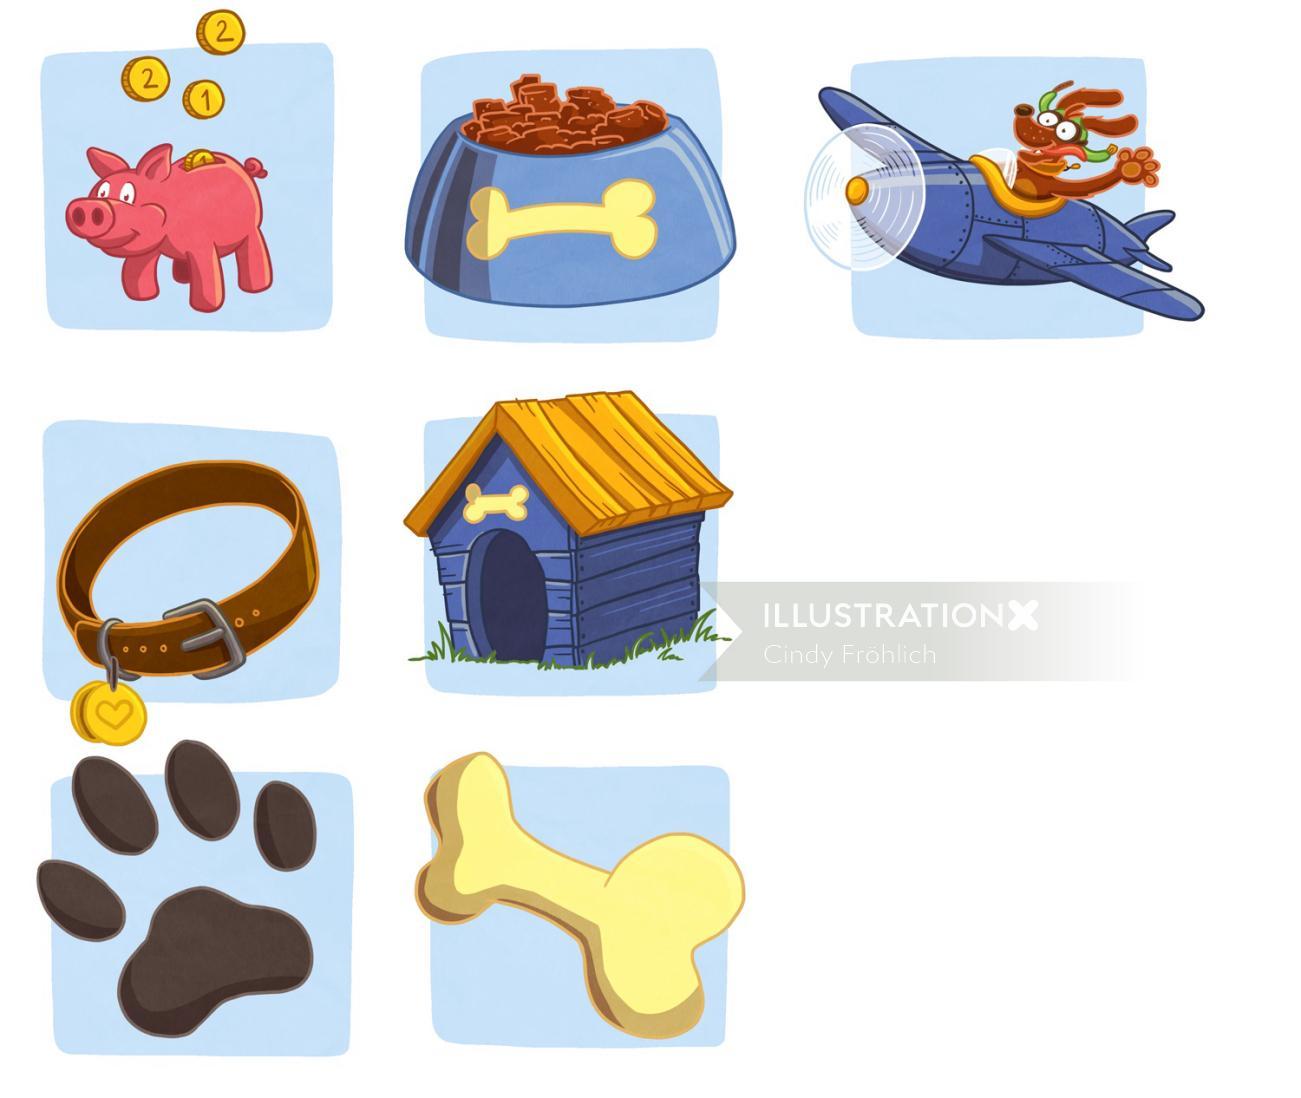 Graphic illustration of dog accessories